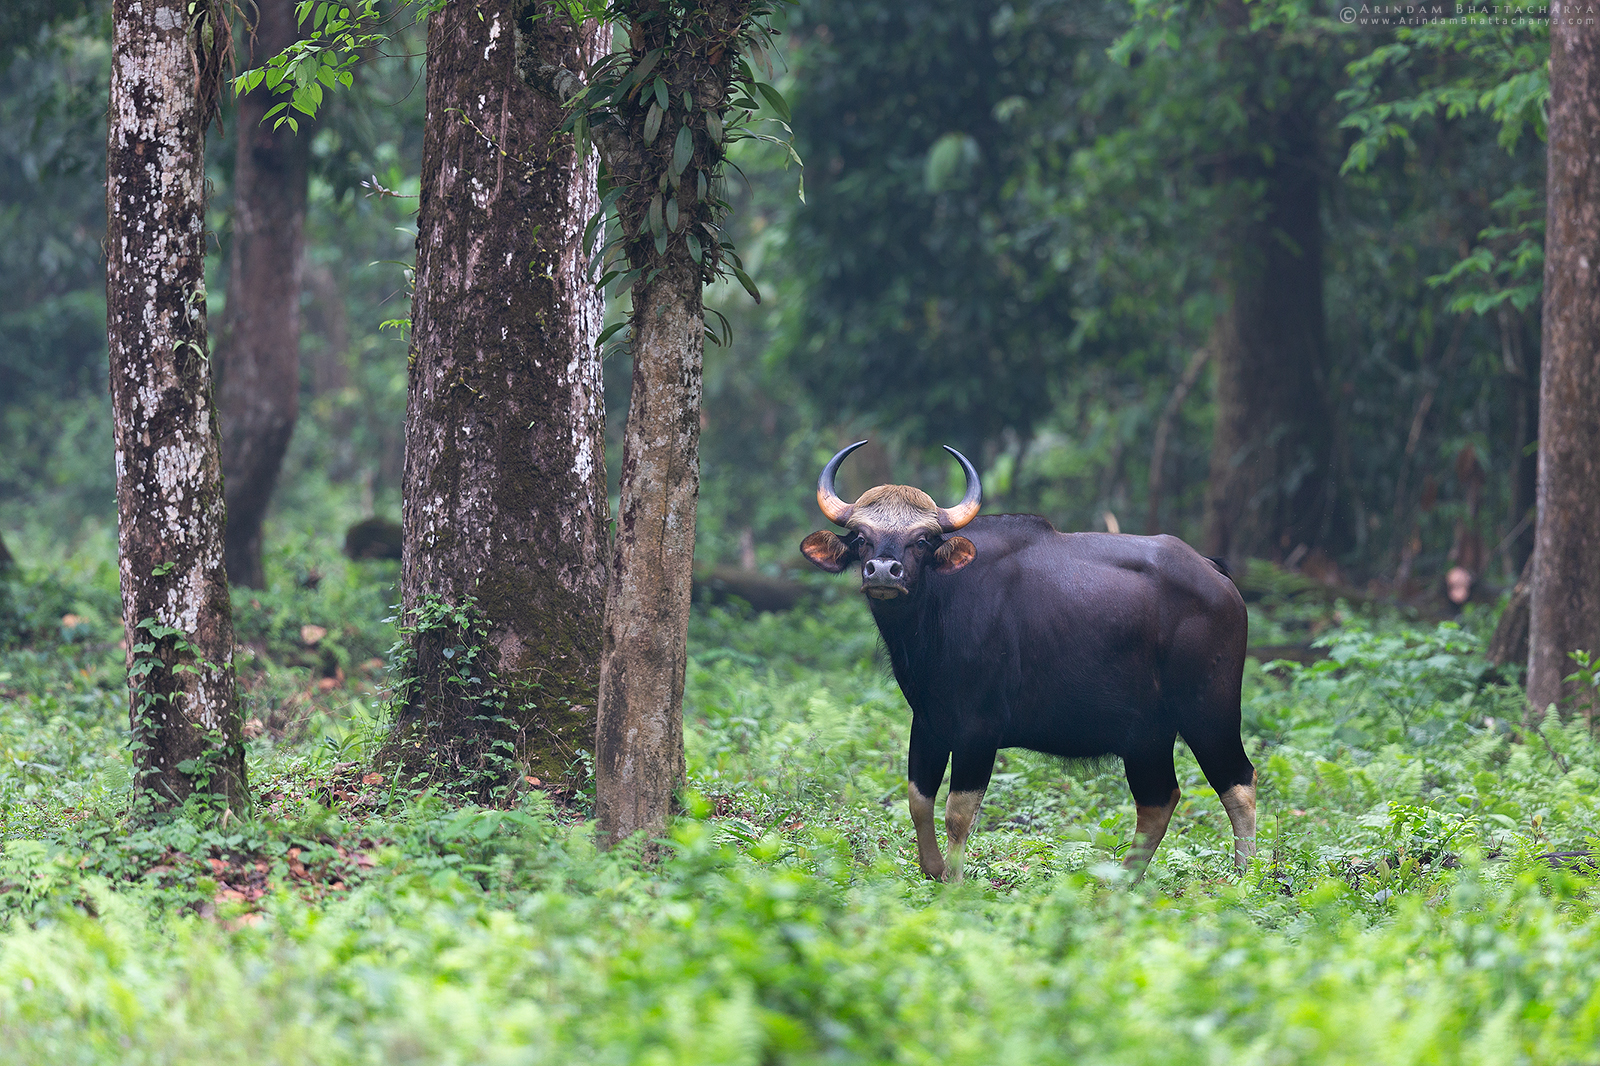 Indian Bison or Bos gaurus at Gorumara National Park Dooars West Bengal India Arindam Bhattacharya